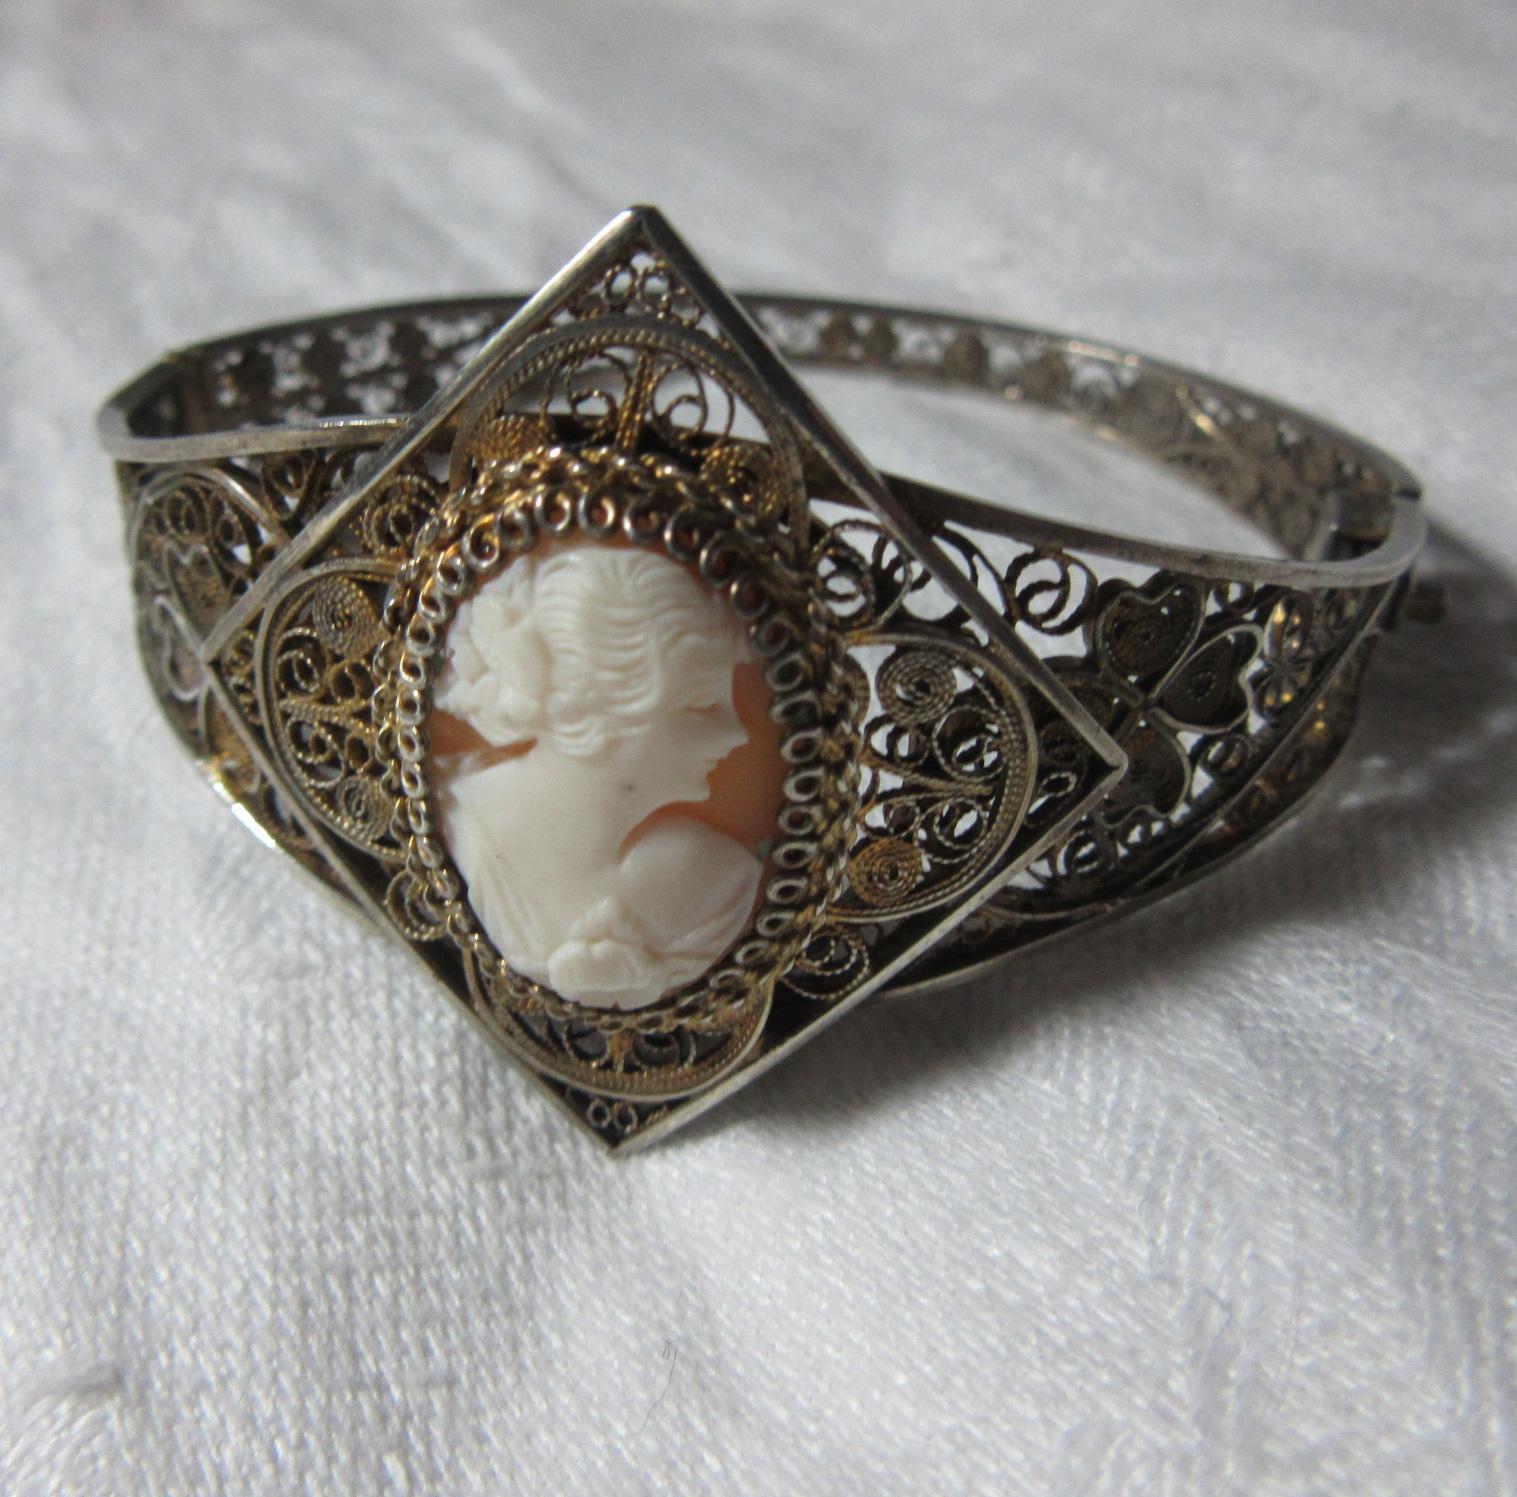 800 Silver Filigree Cameo Carved Shell Bracelet Fine jewelry